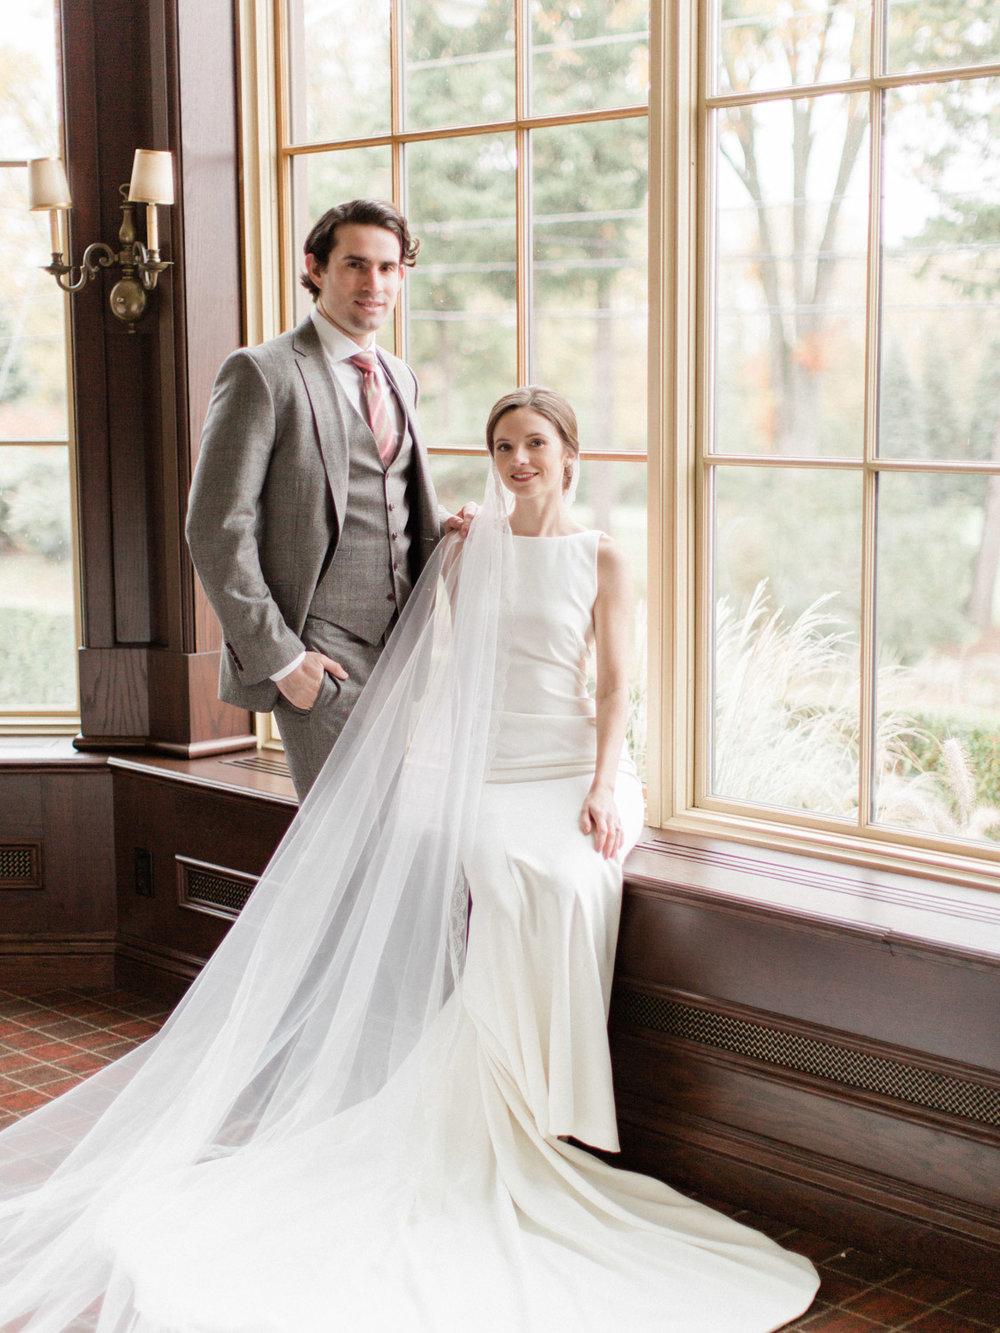 Toronto-wedding-photographer-st-georges-golf-club-jewish-modern-fall39.jpg